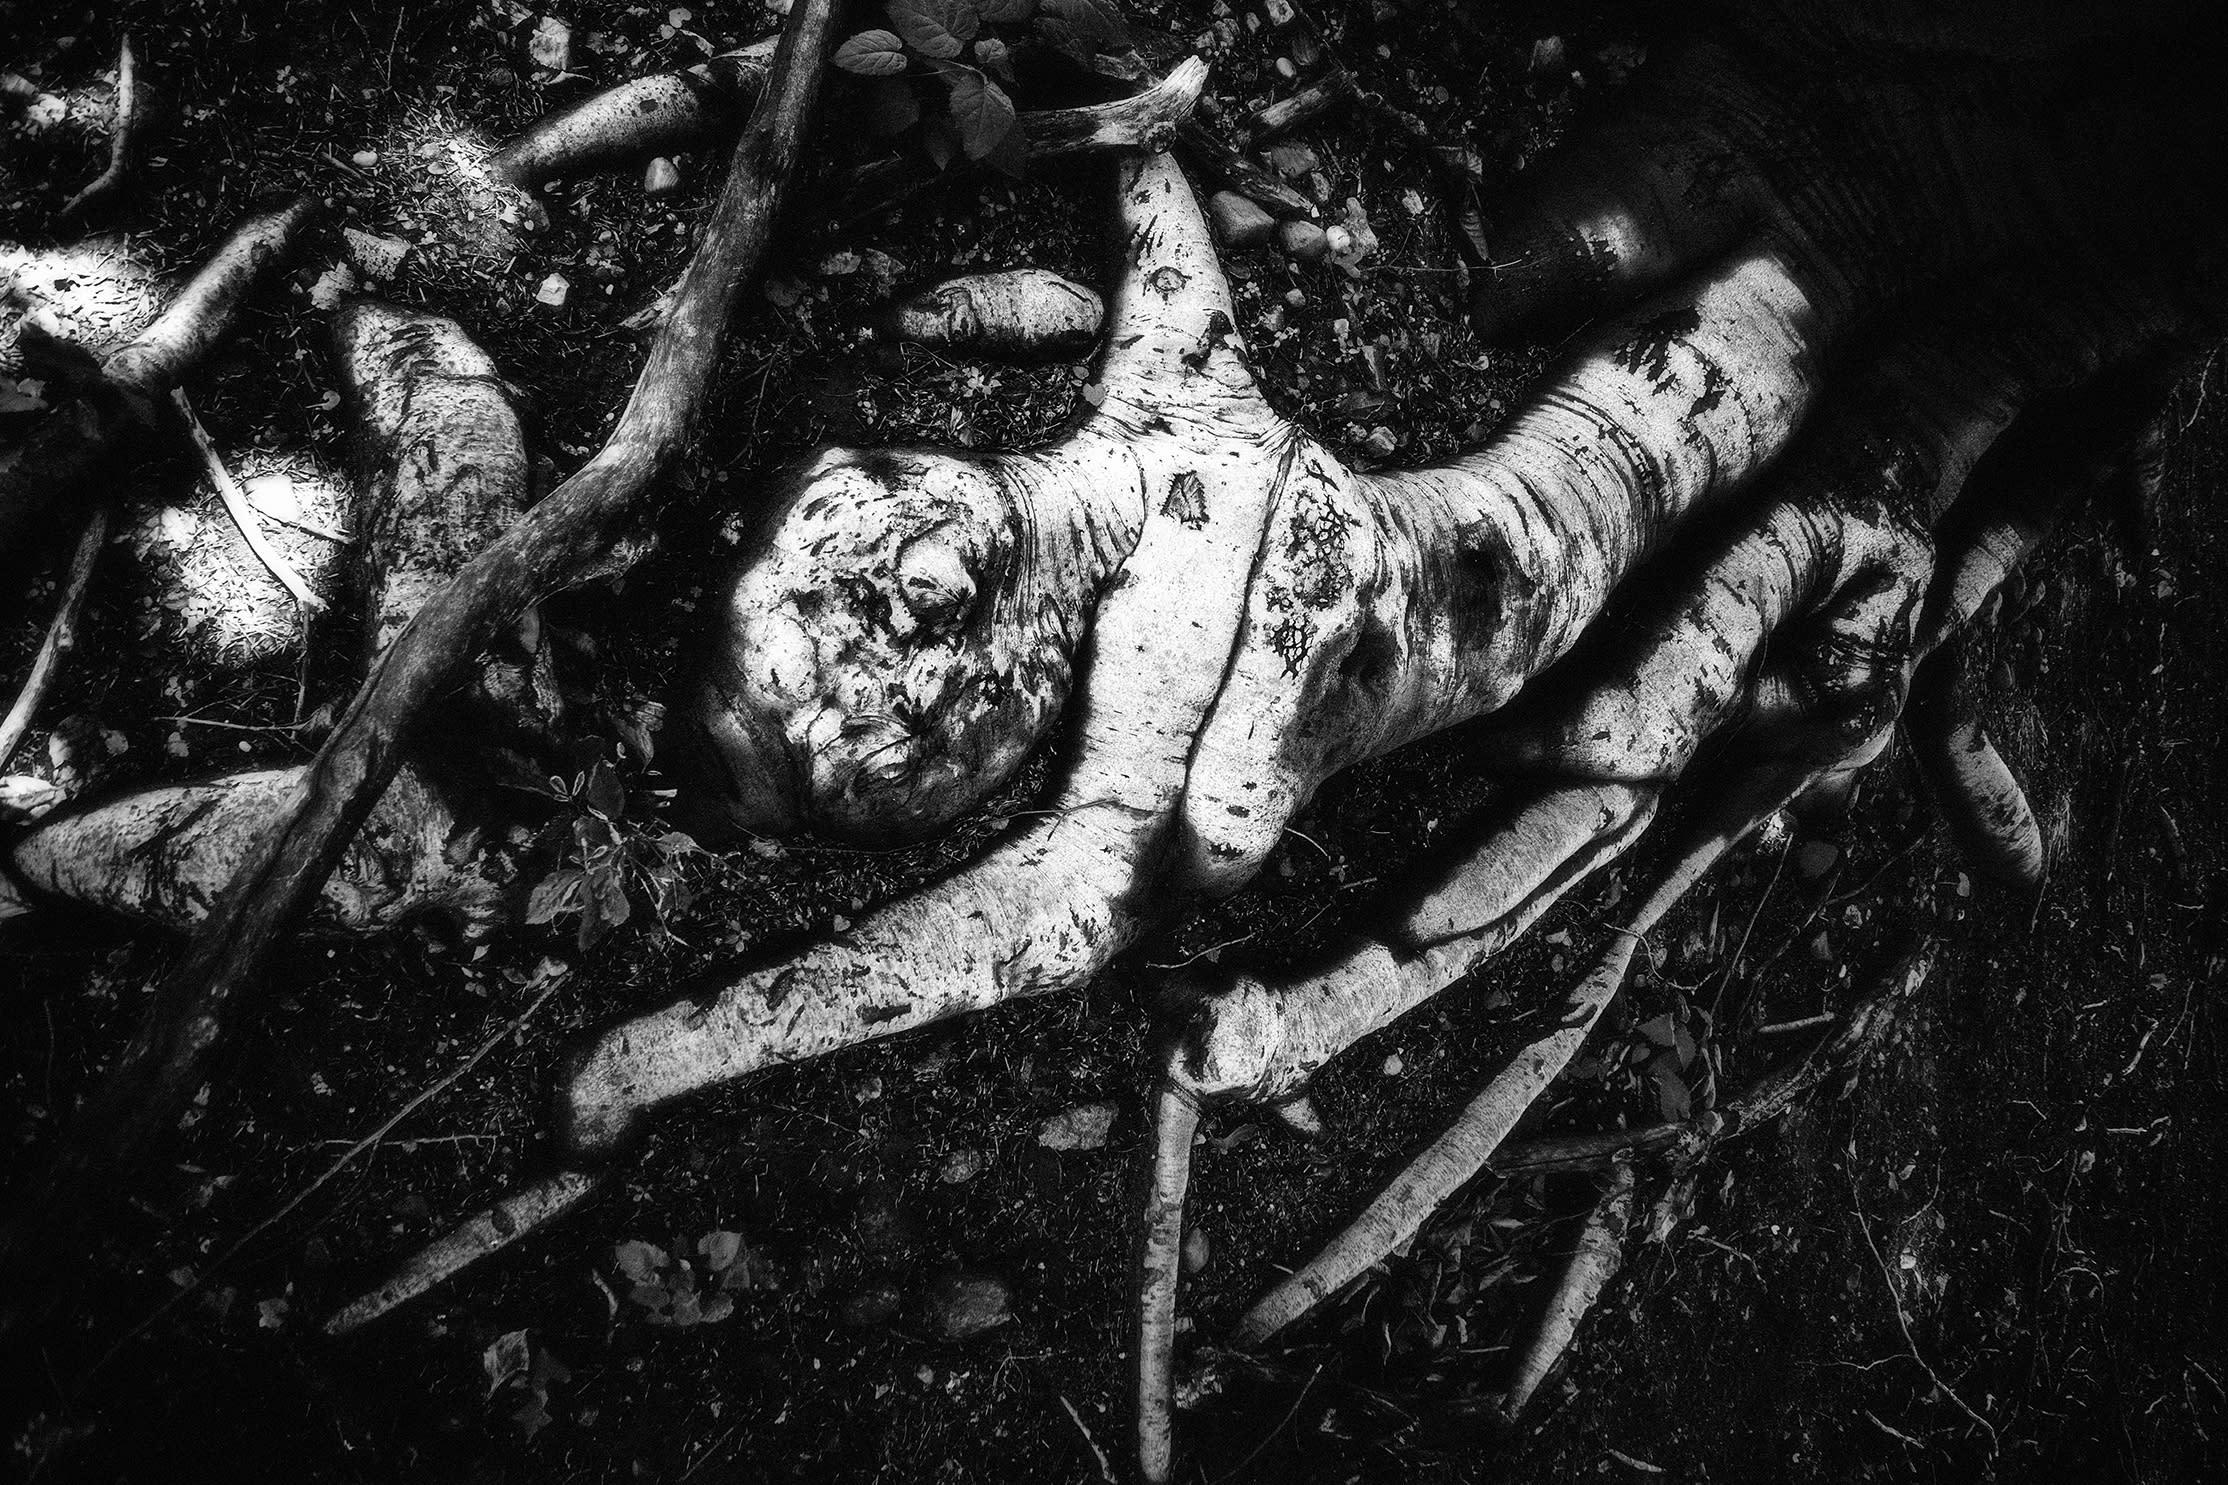 Hanged man lvmlzp